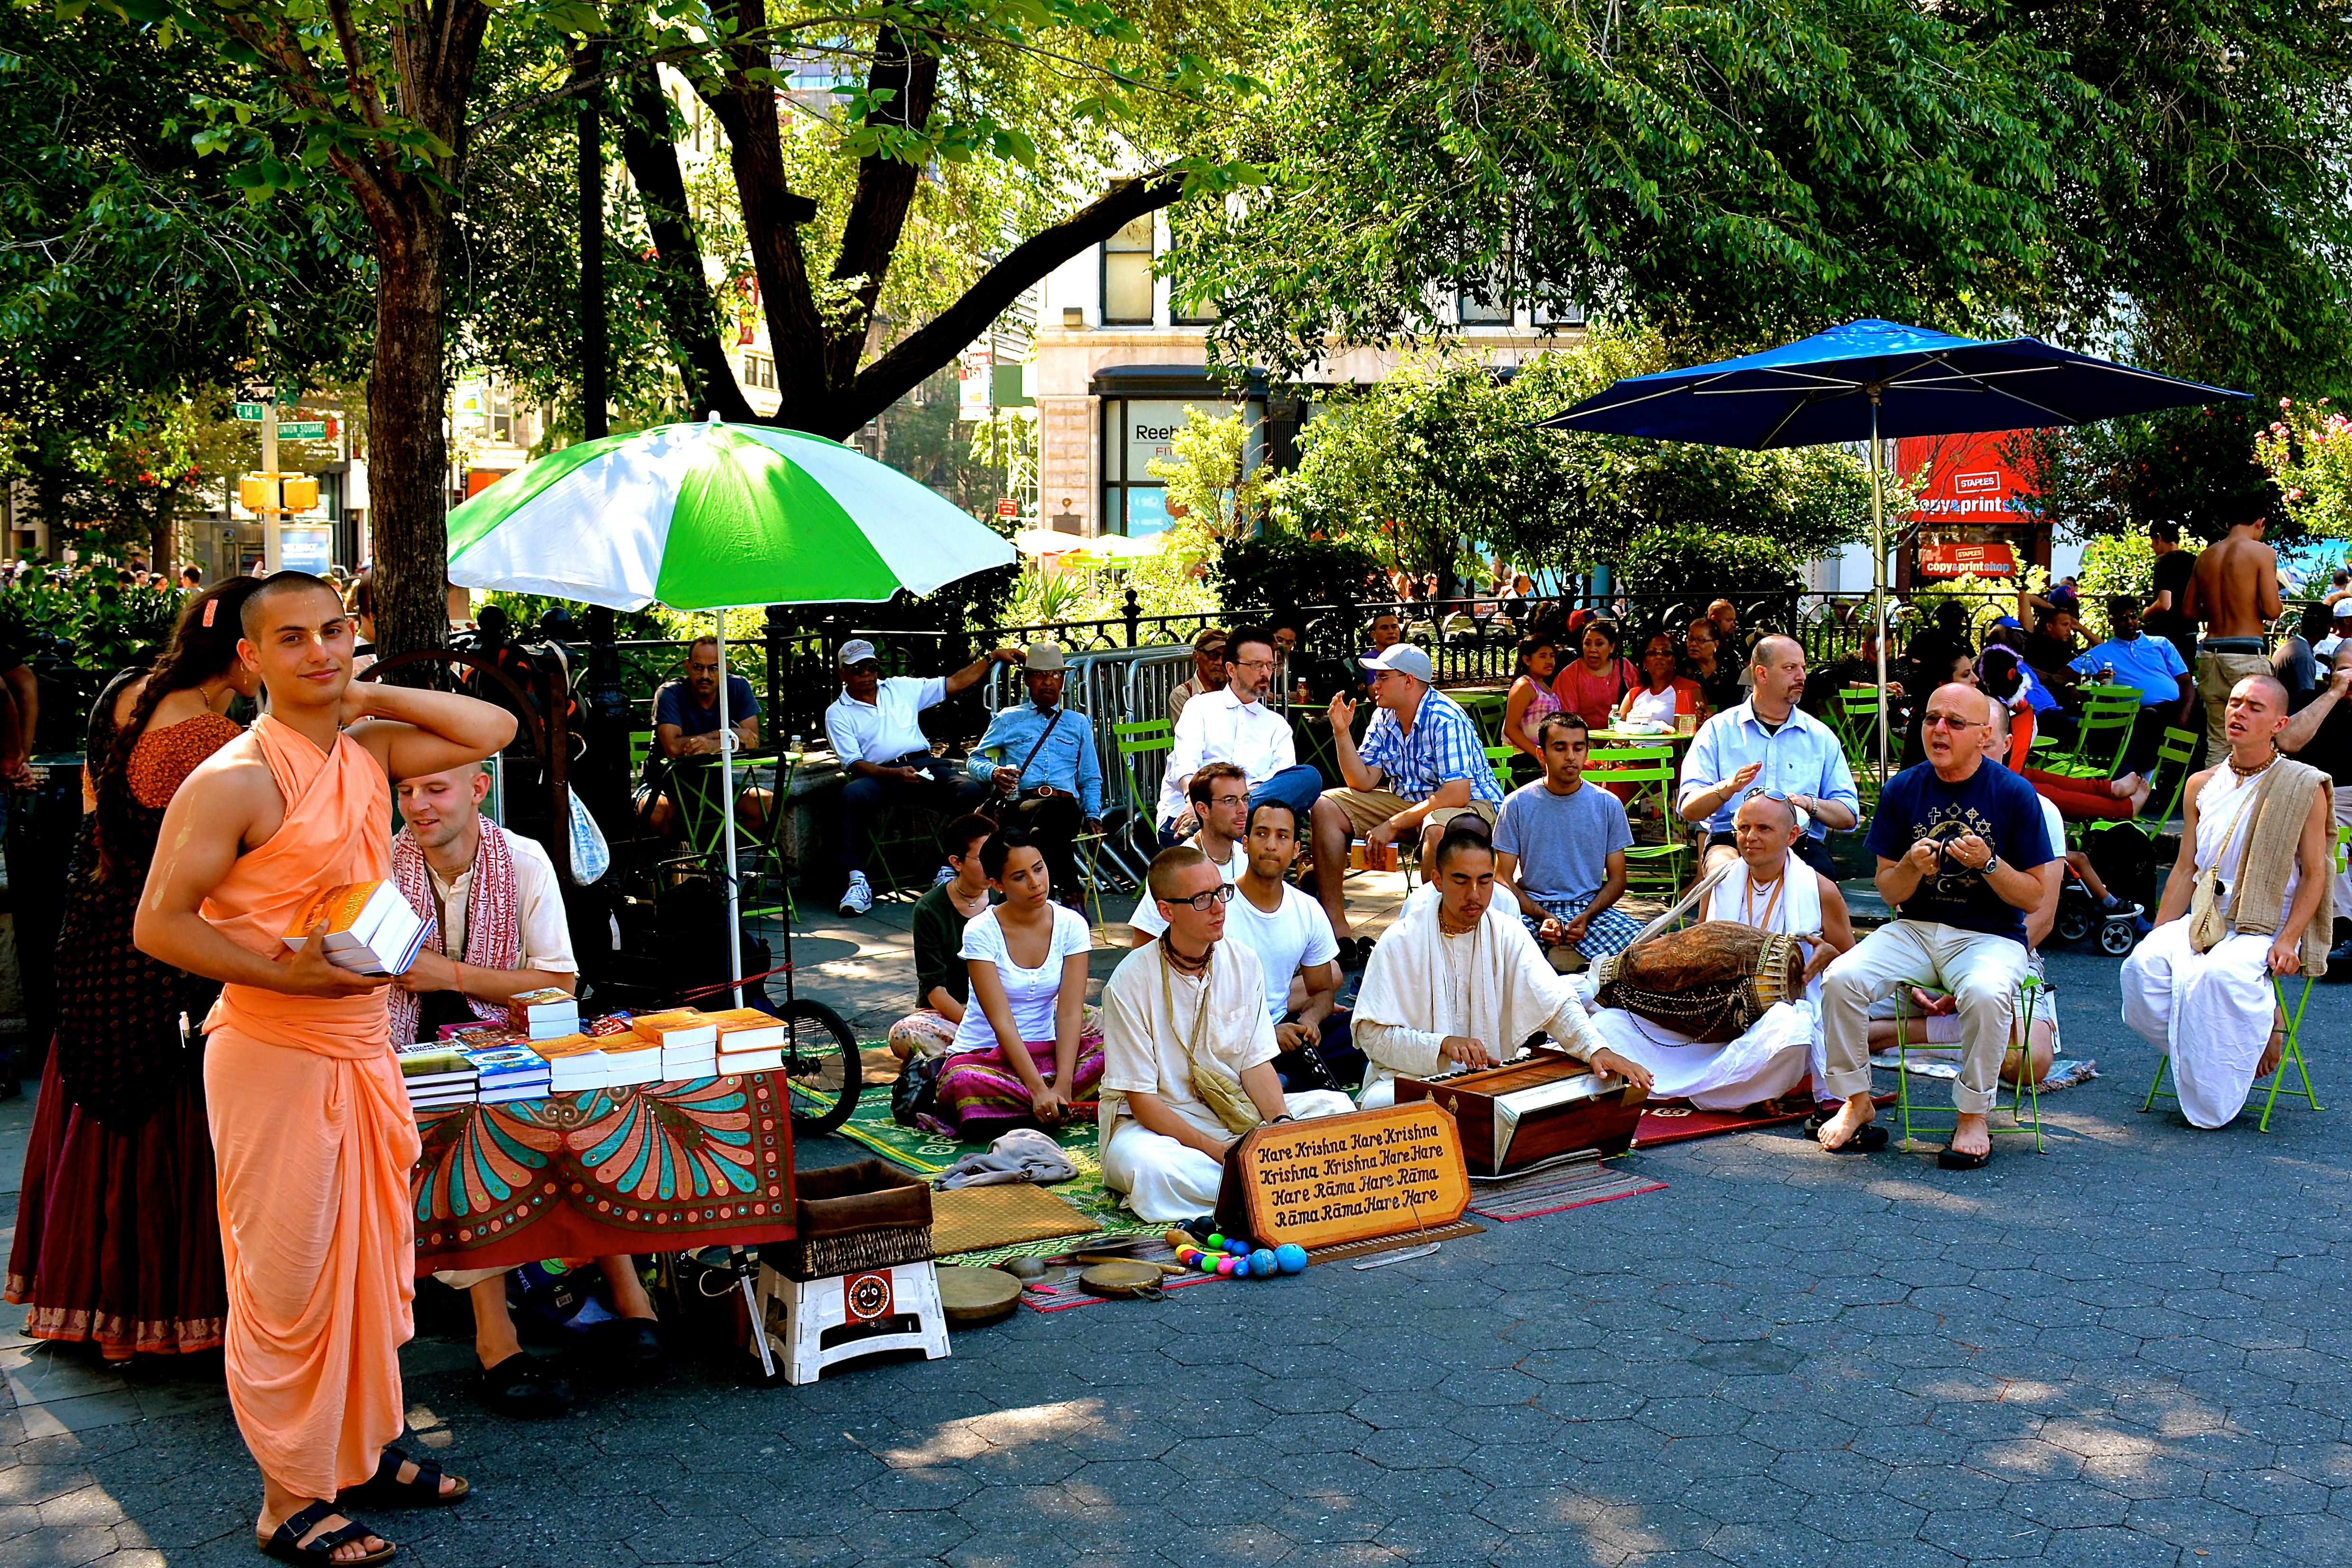 Hare Krishnas in Union Square, New York